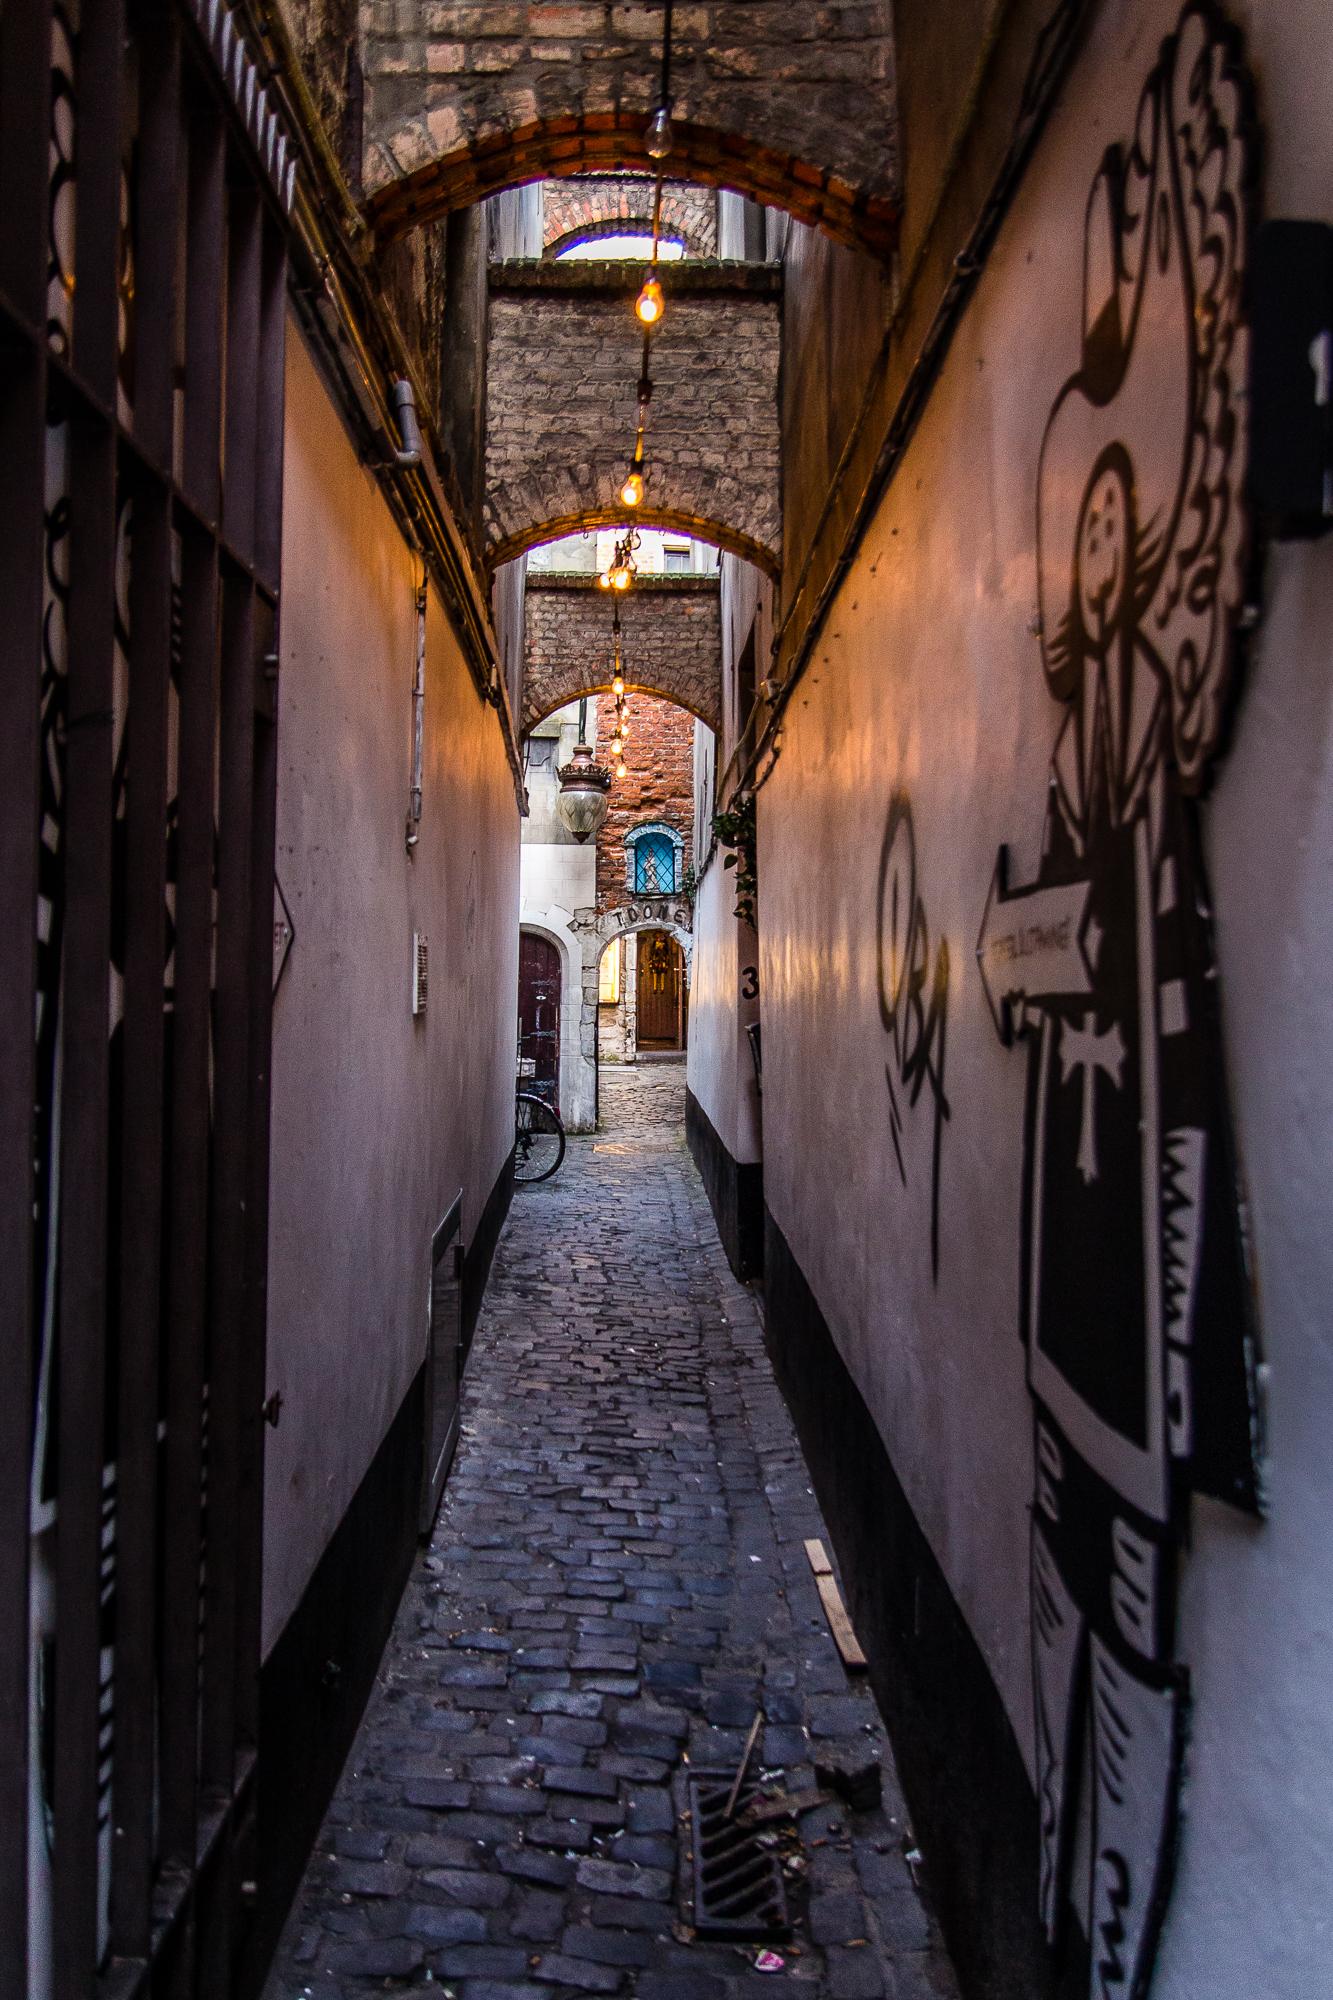 Narrow Street Of Brussels Via @Atisgailis